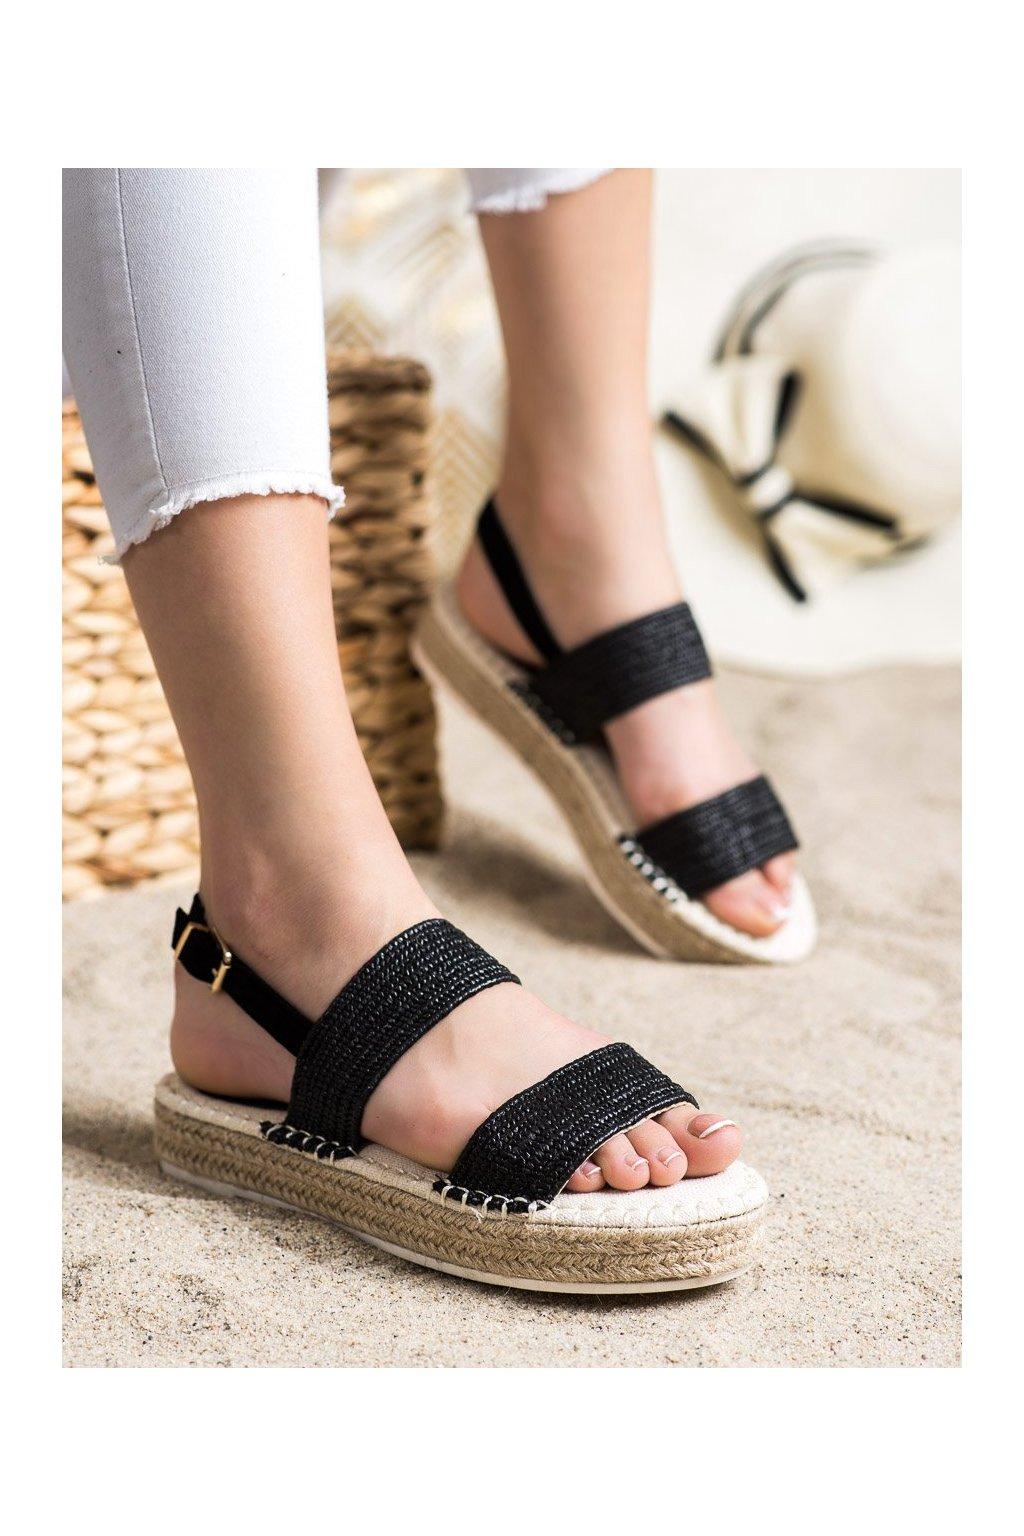 Čierne sandále Shelovet kod WSA-65B